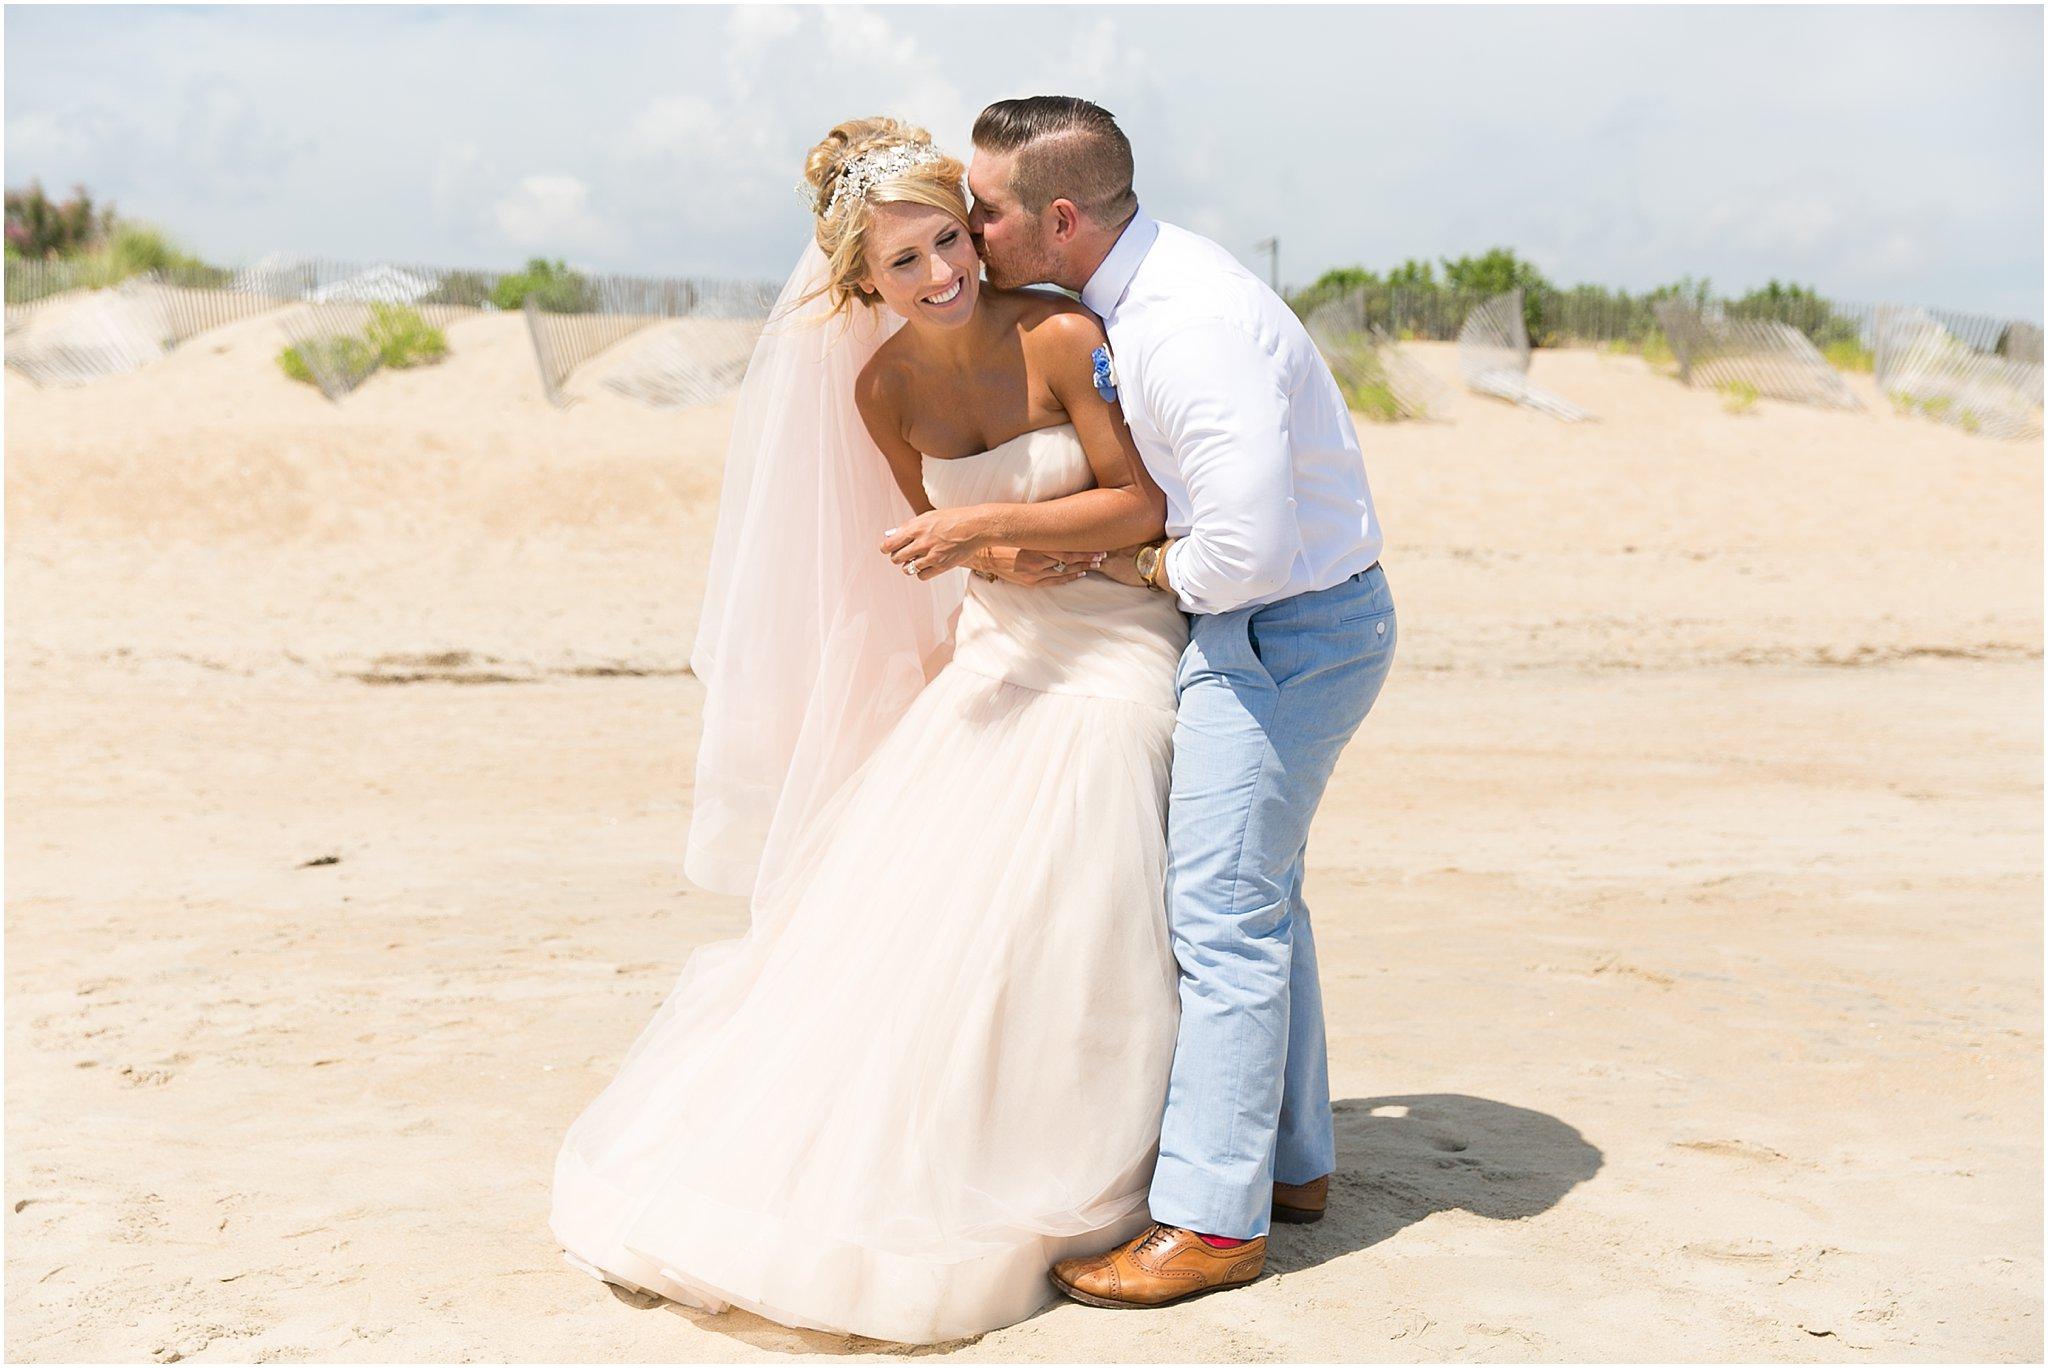 jessica_ryan_photography_wedding_hampton_roads_virginia_virginia_beach_weddings_0625